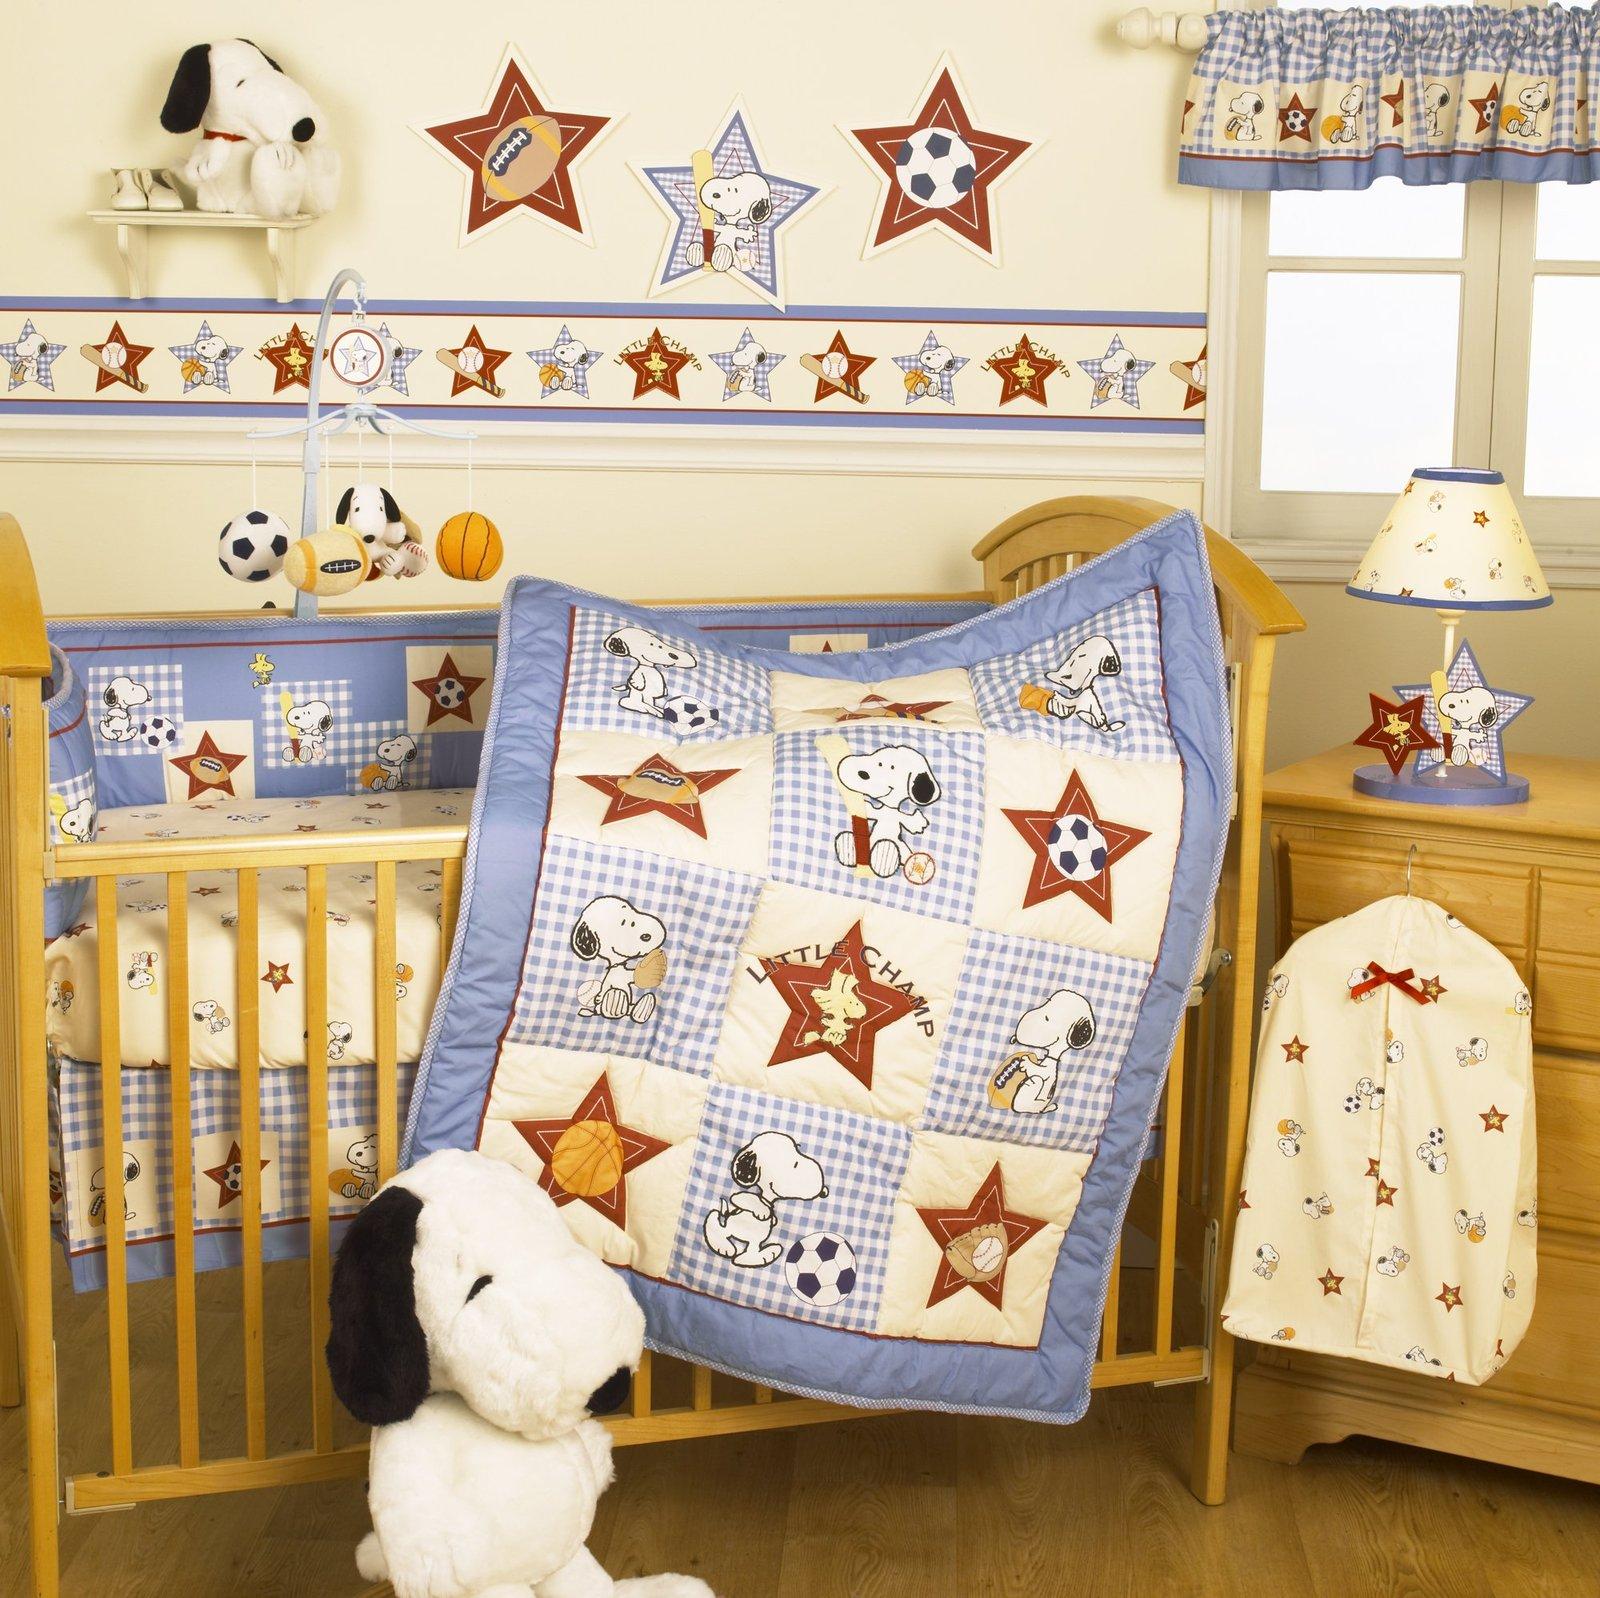 Bedtime Originals Champ Snoopy Wallpaper Border   Best Price 1600x1598